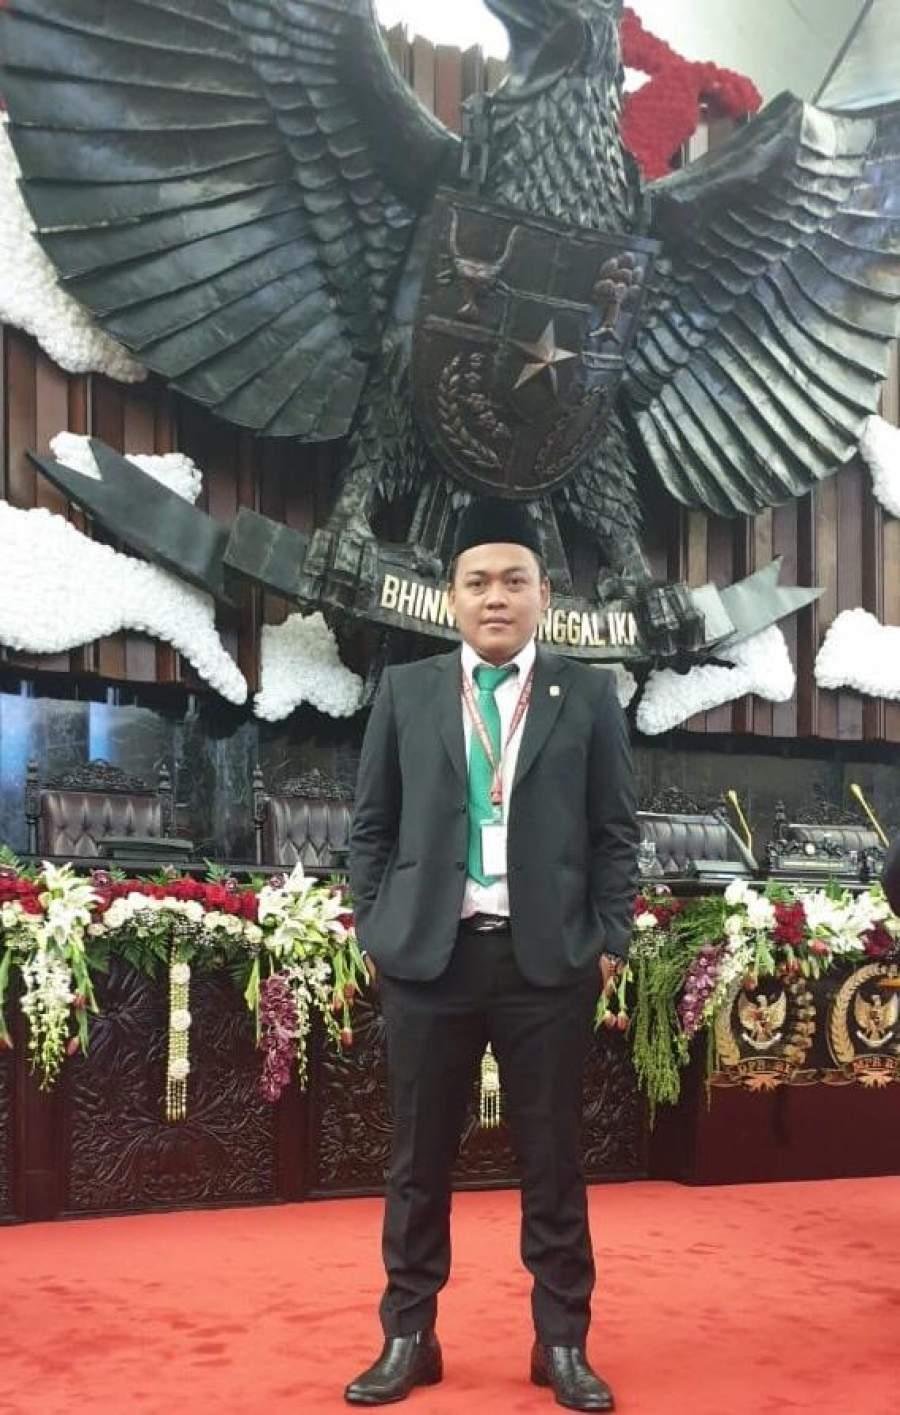 Anggota DPR Ajak Masyarakat Lindungi Pejabat Negara